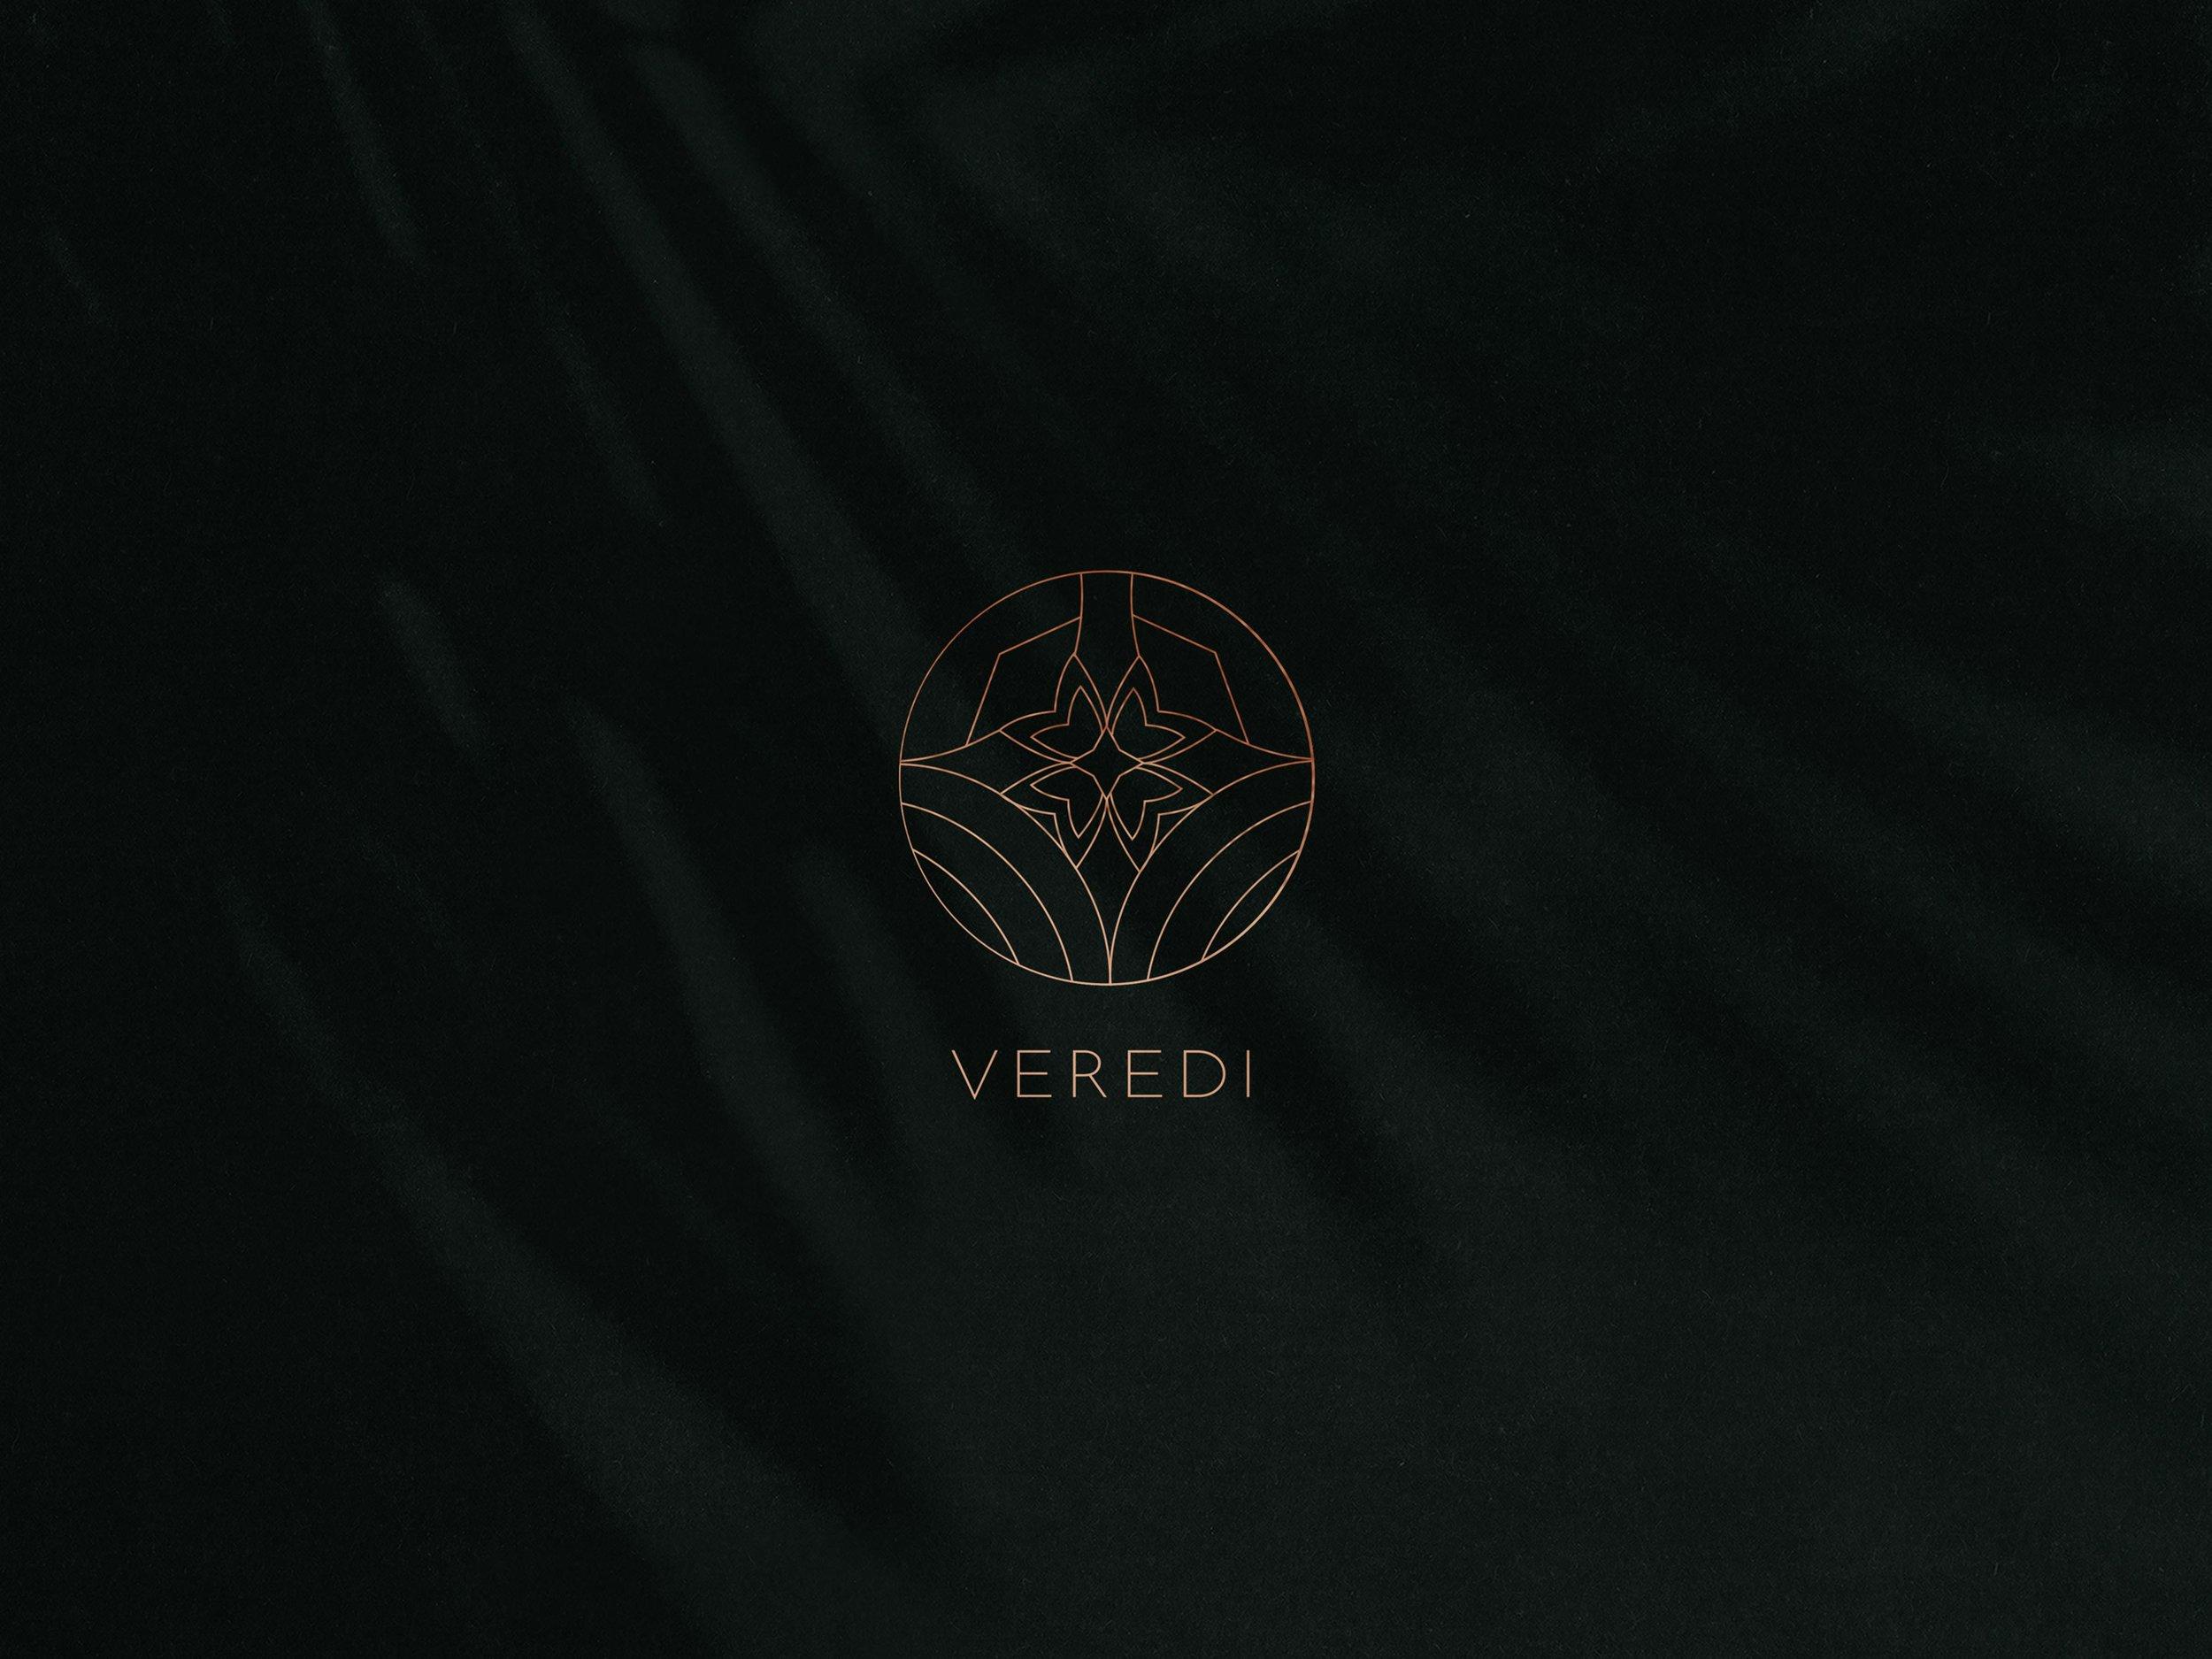 Veridi-Logo-Leather-and-shadow.jpg